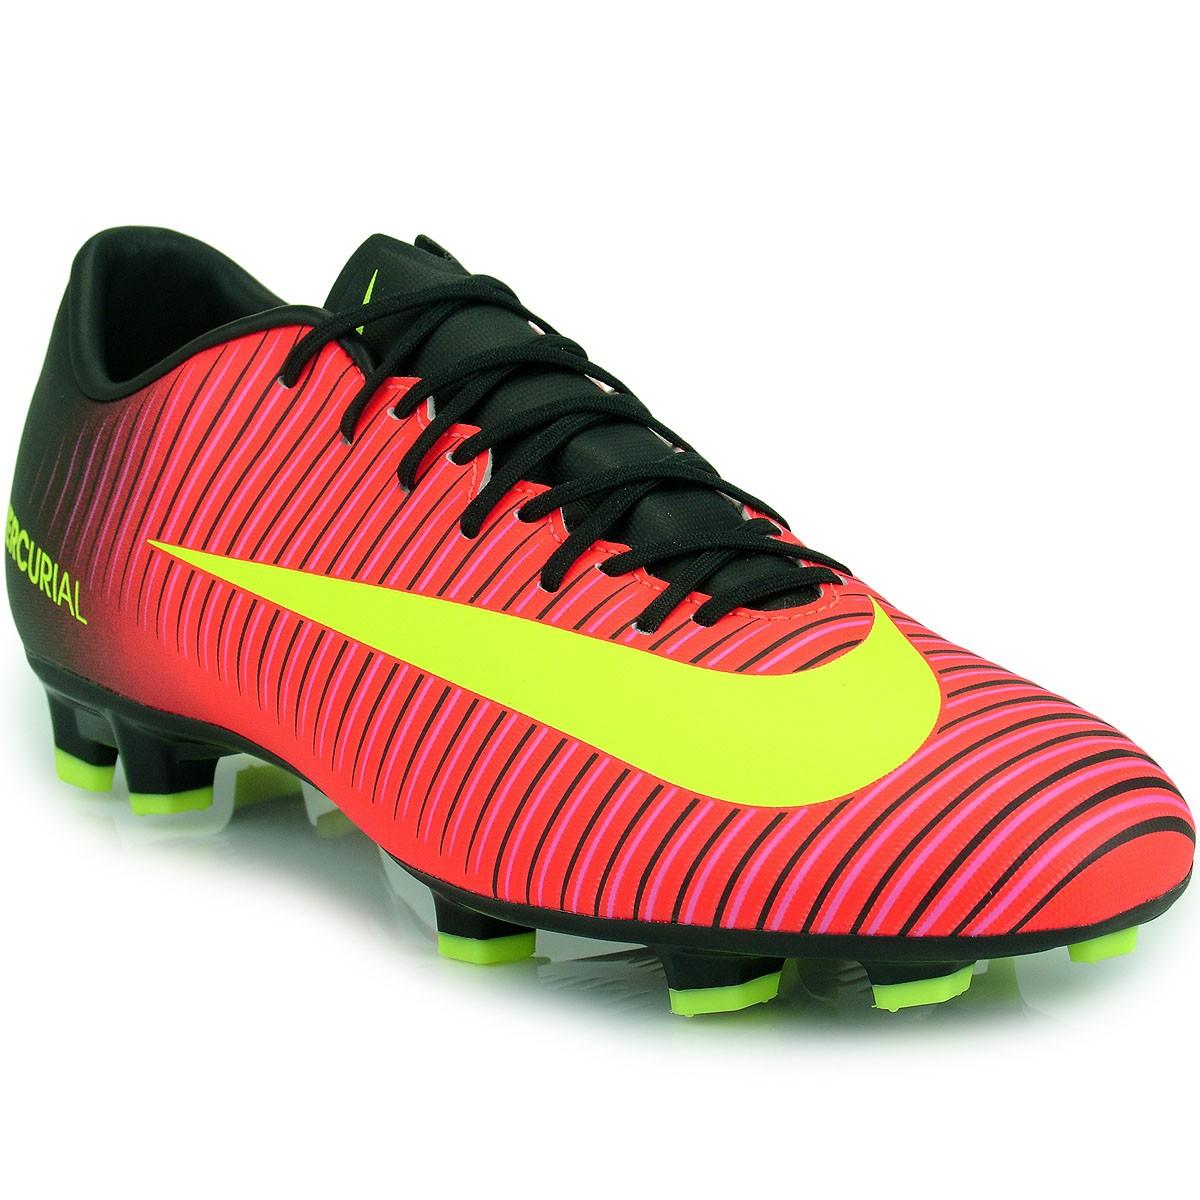 Chuteira Nike Mercurial Victory VI FG  8c7bf6a858237